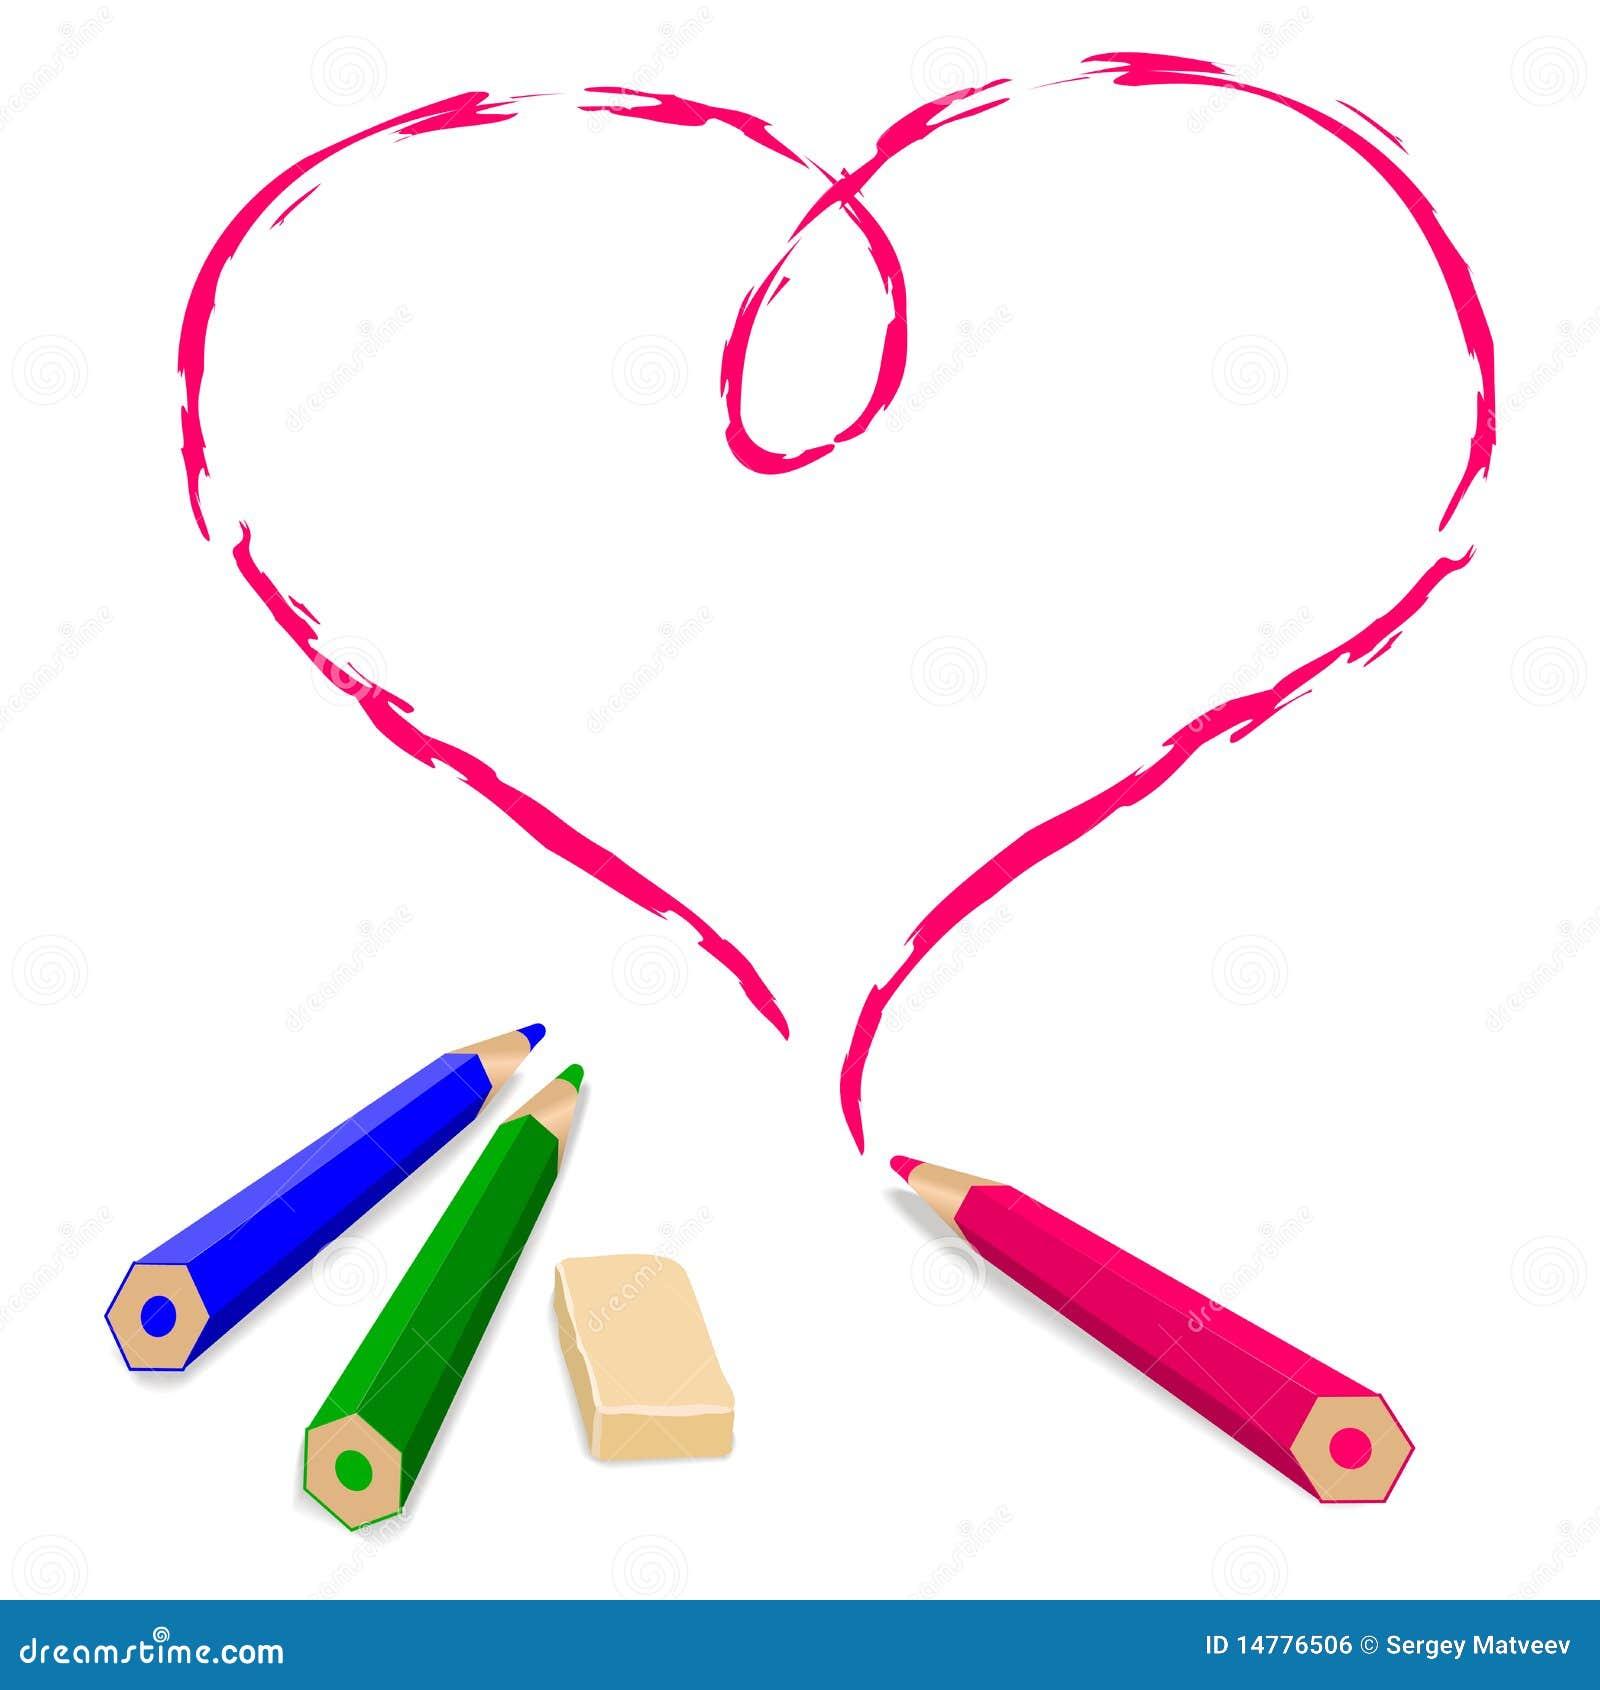 Pencil Draw Heart Stock Vector Illustration Of Shape 14776506